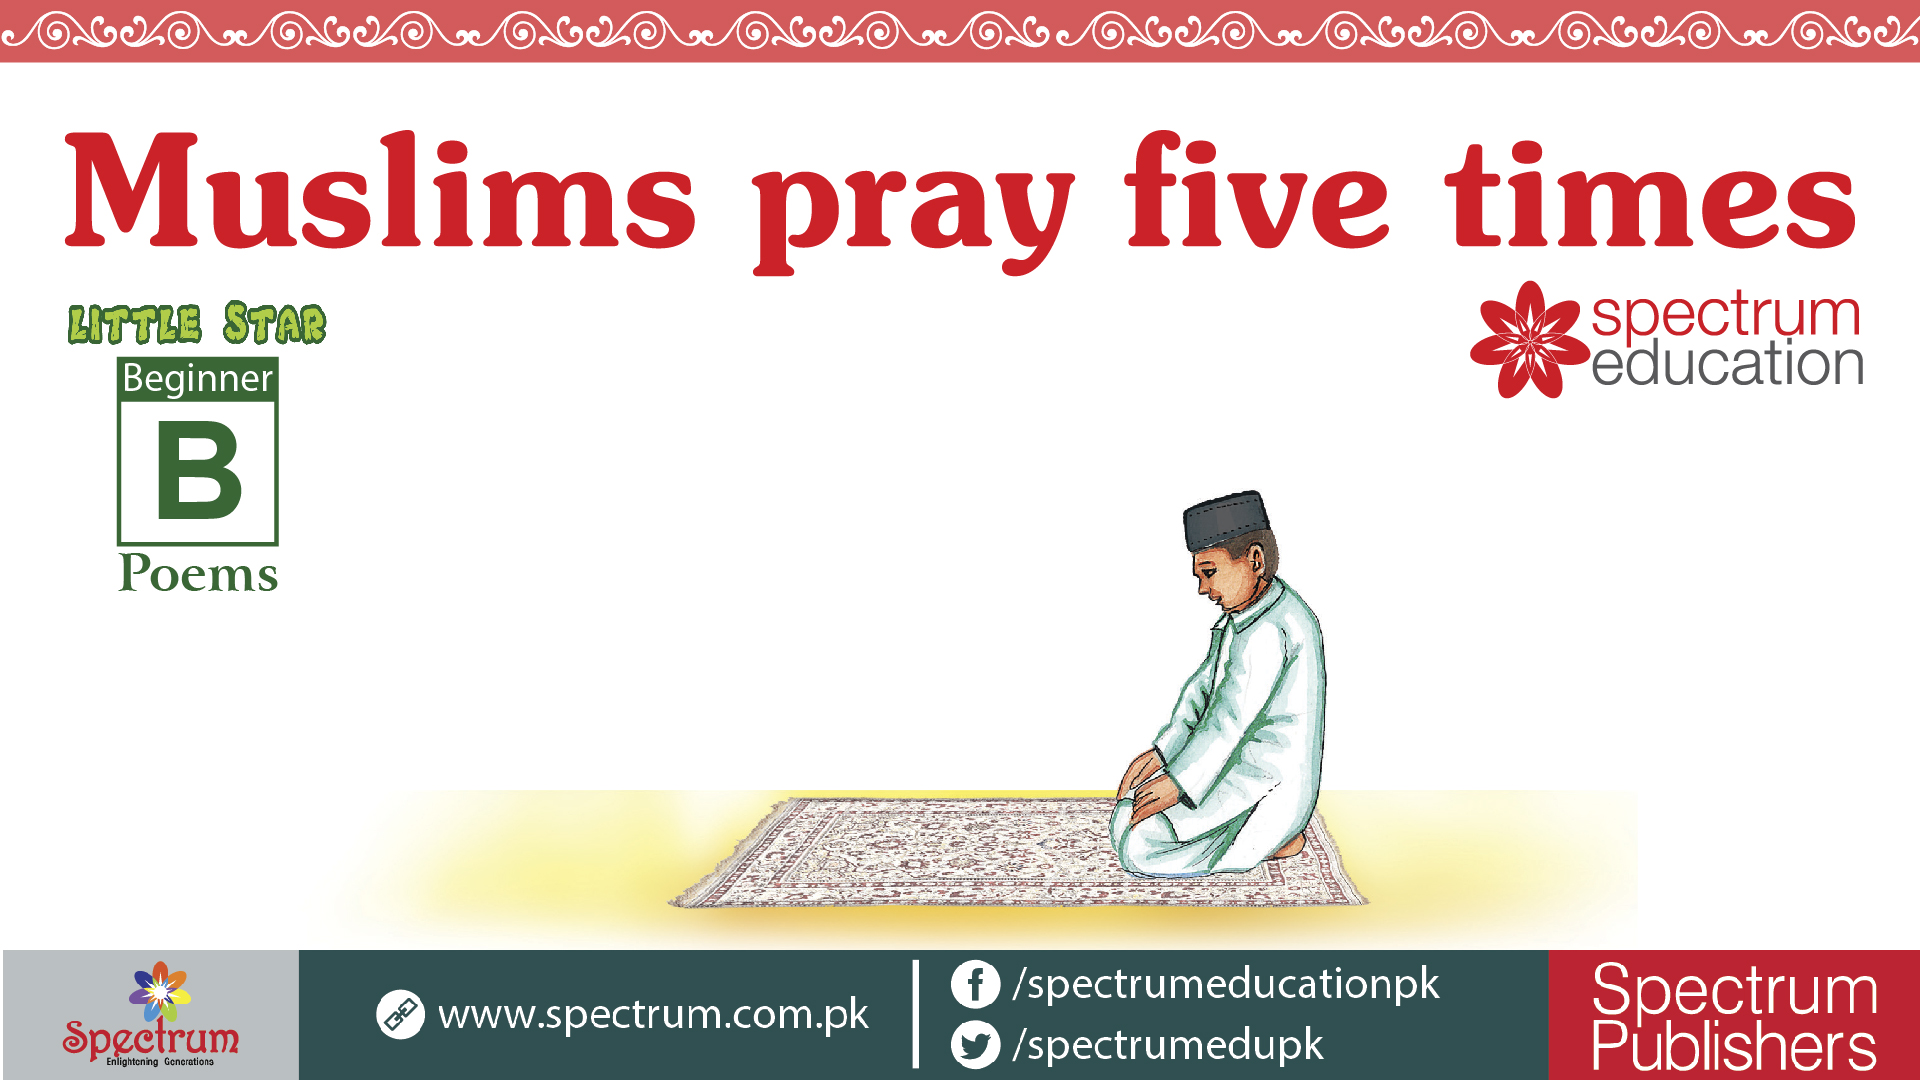 Muslims pray five times